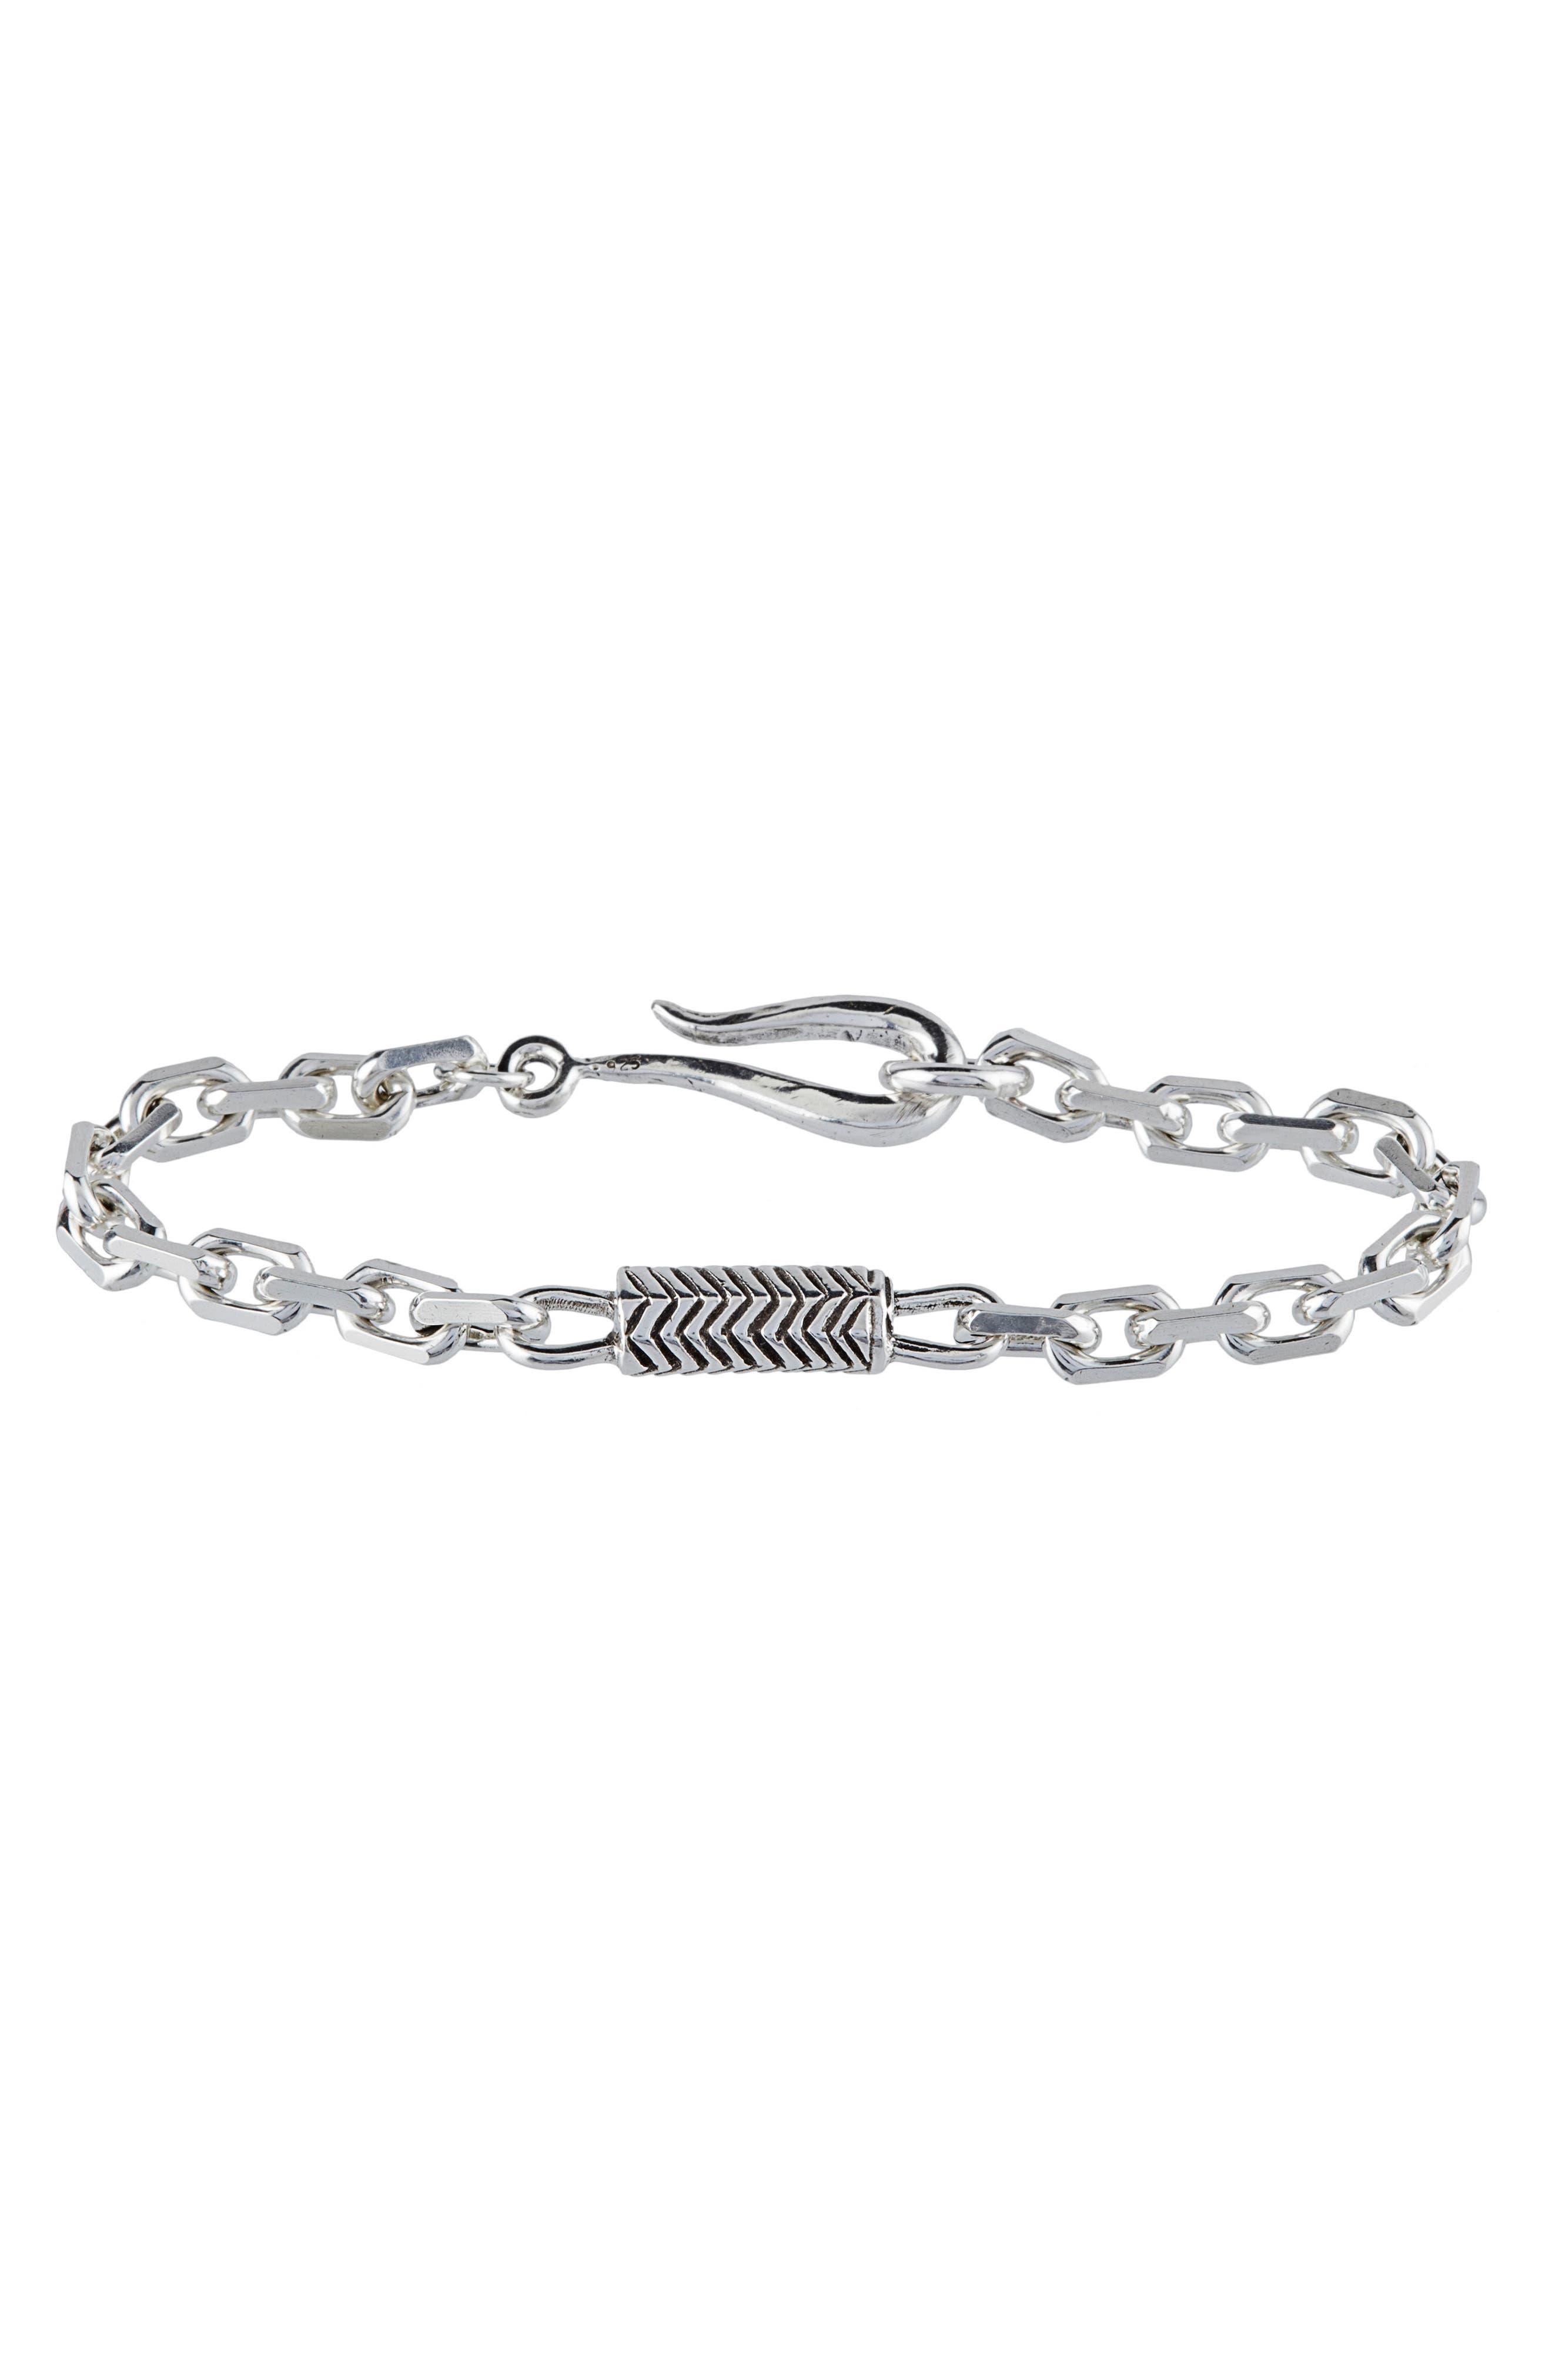 Main Image - Lewis Henry Nicholas Hiapo Chain Bracelet